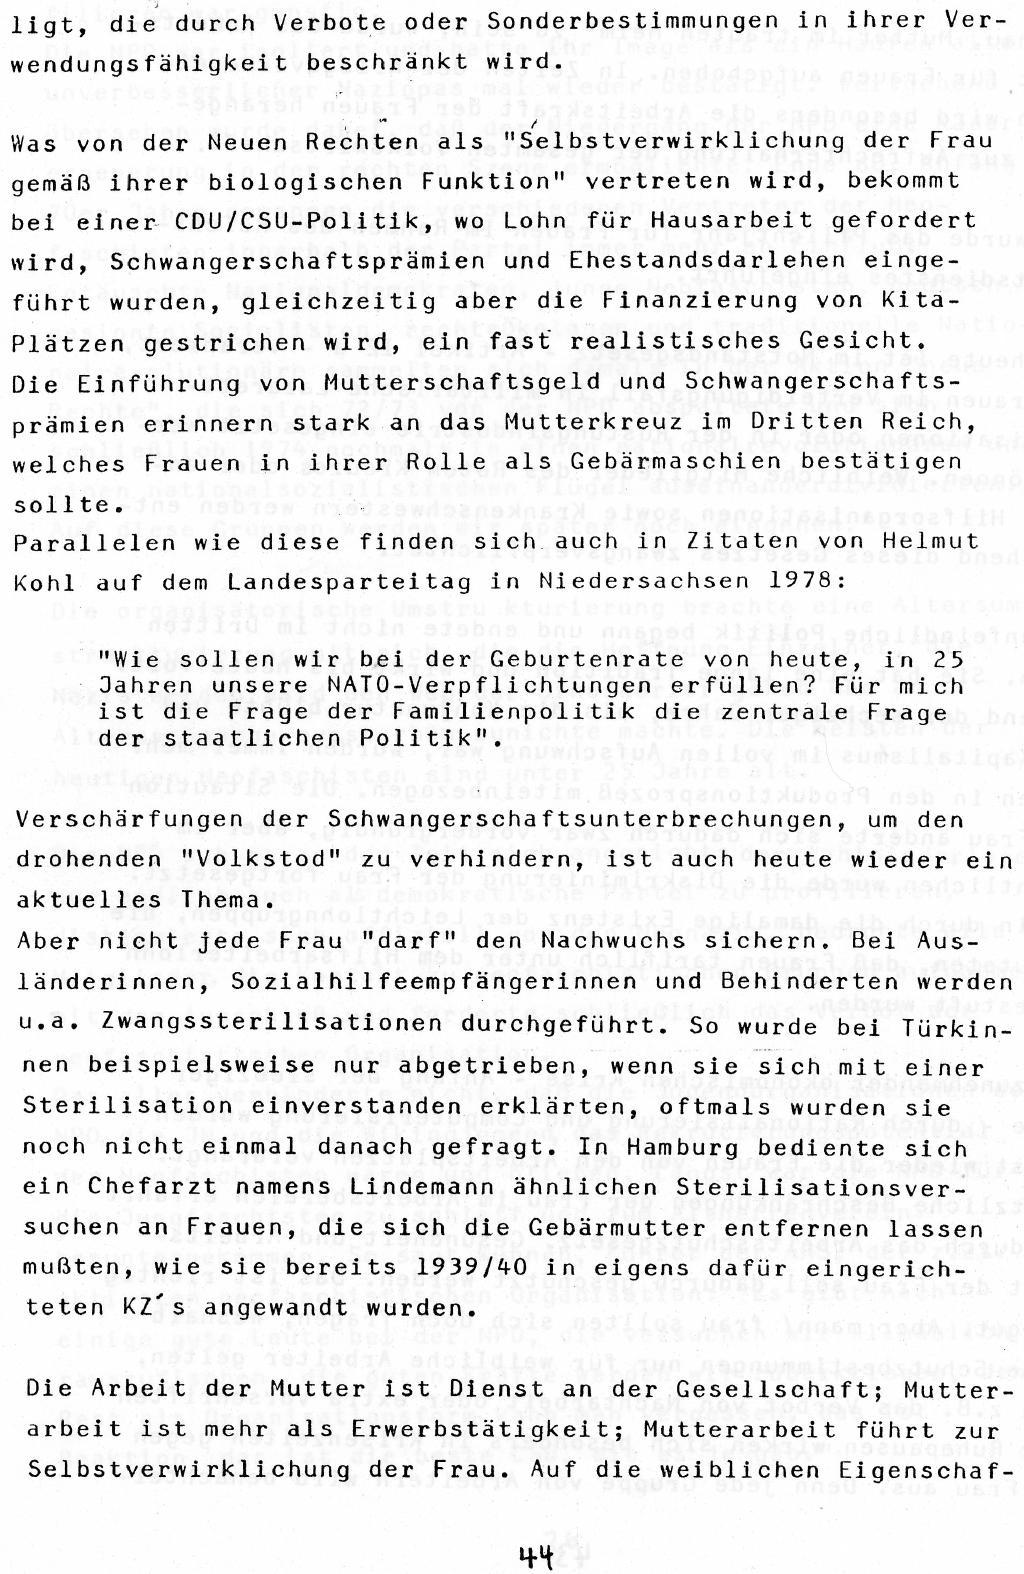 Berlin_1983_Autonome_Gruppen_Faschismus_im_Kapitalismus_44